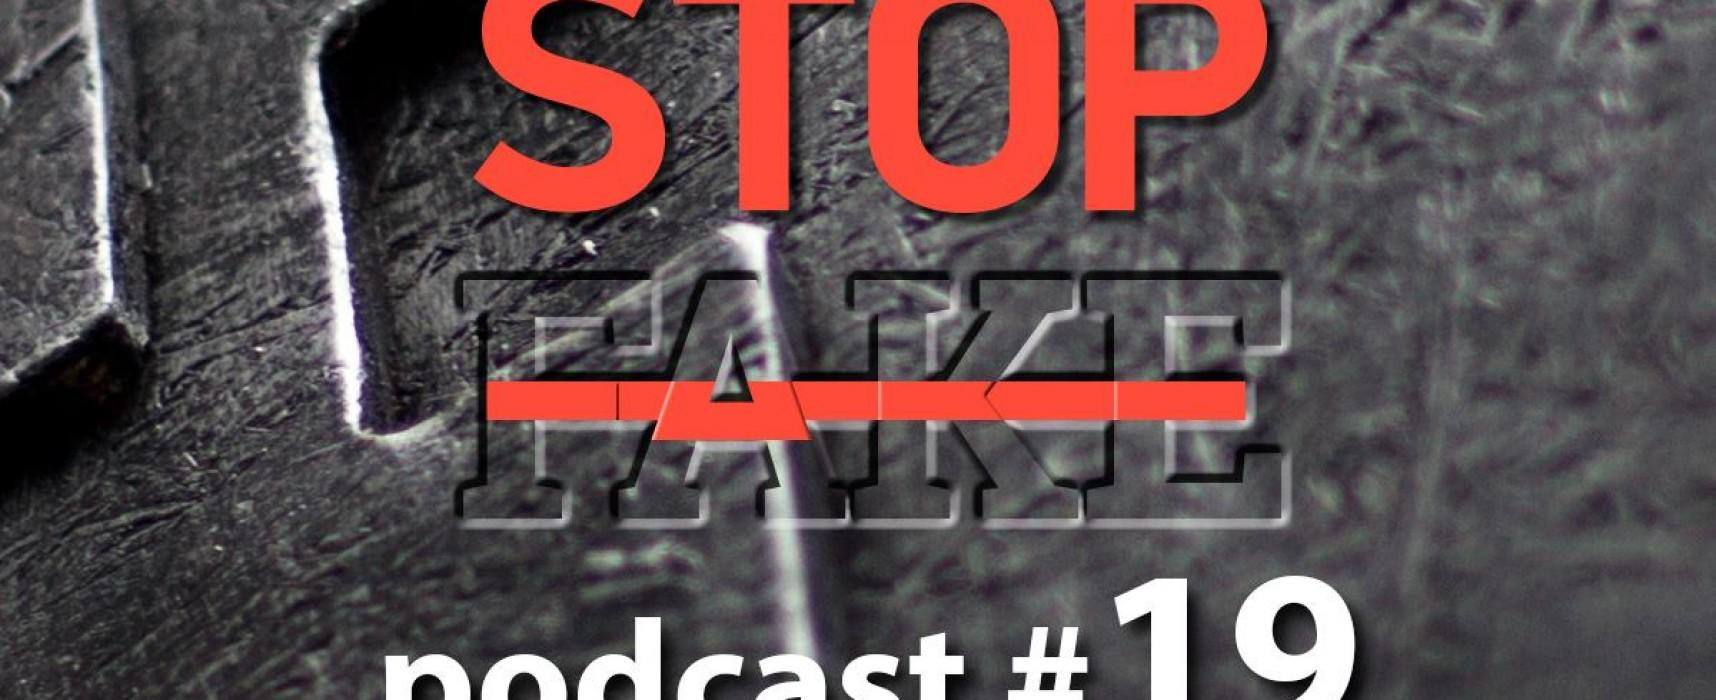 StopFake podcast #19